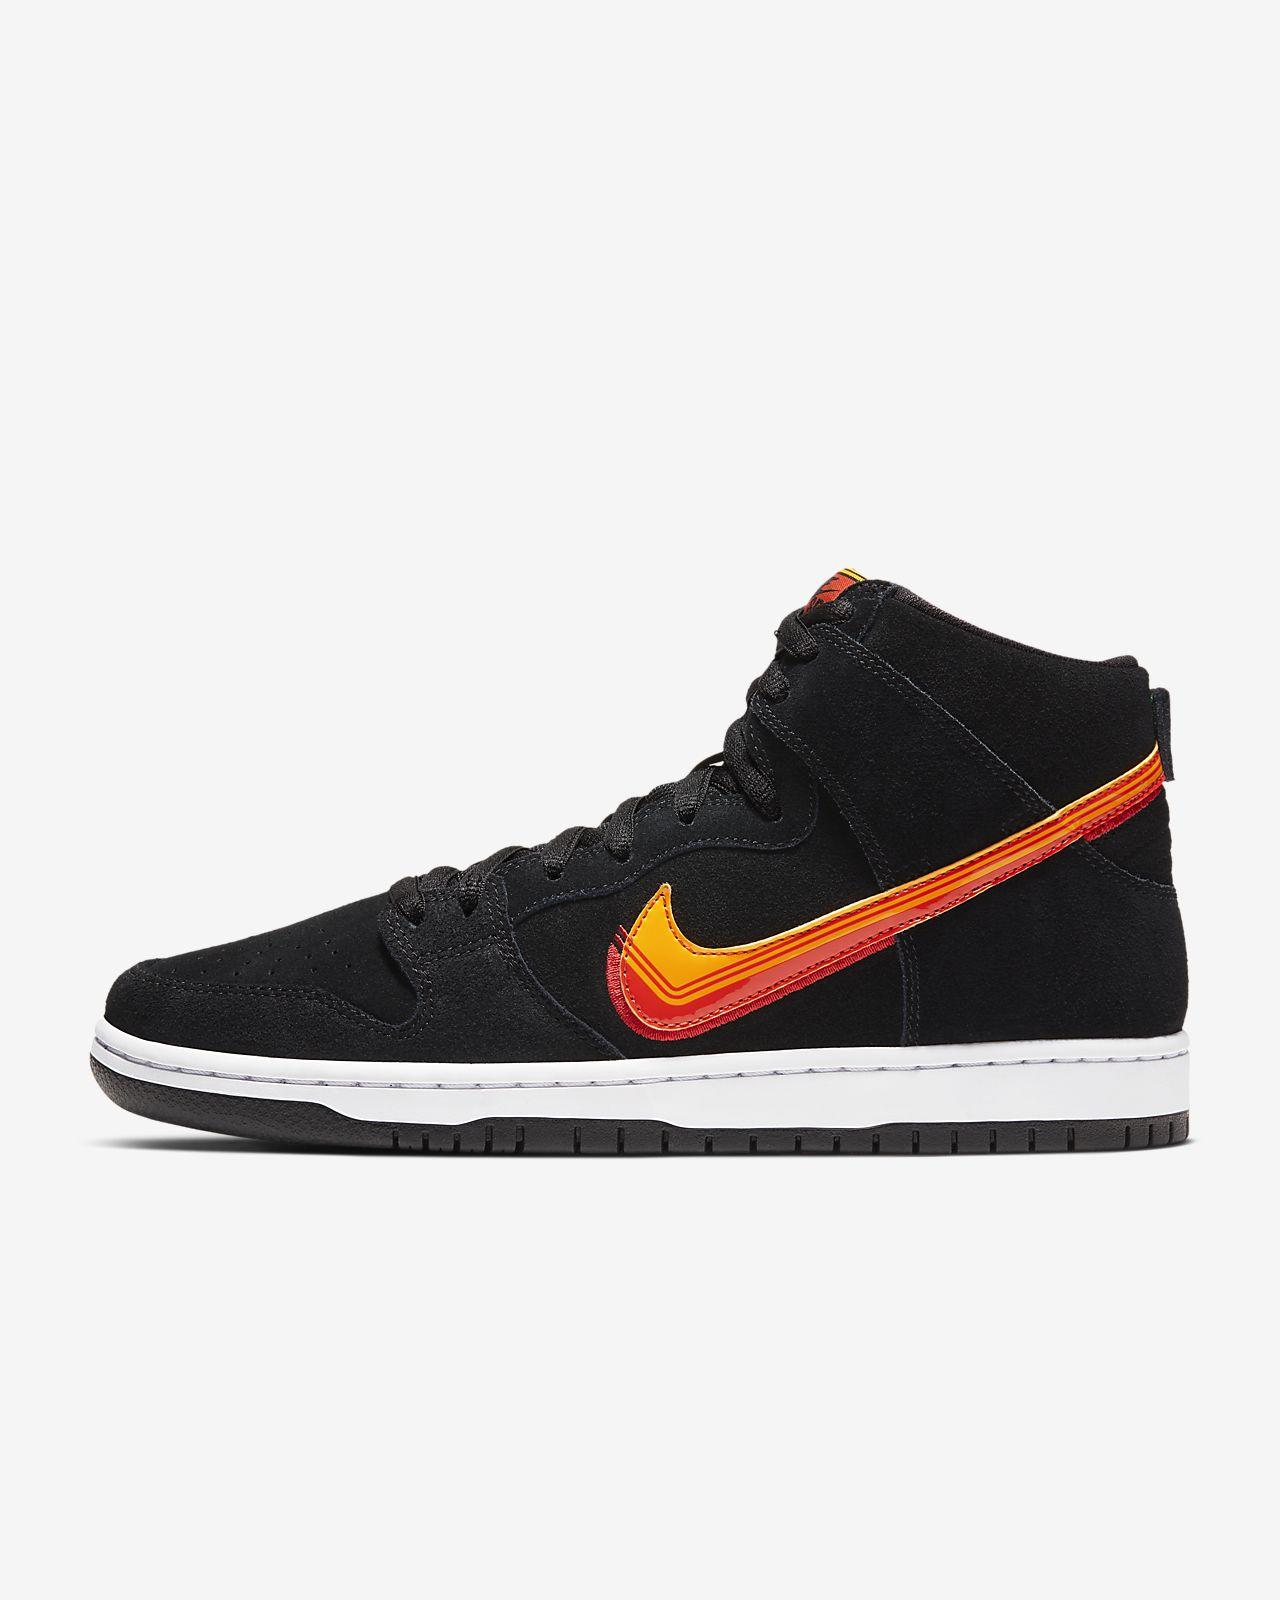 Nike SB Dunk High Pro 男款滑板鞋